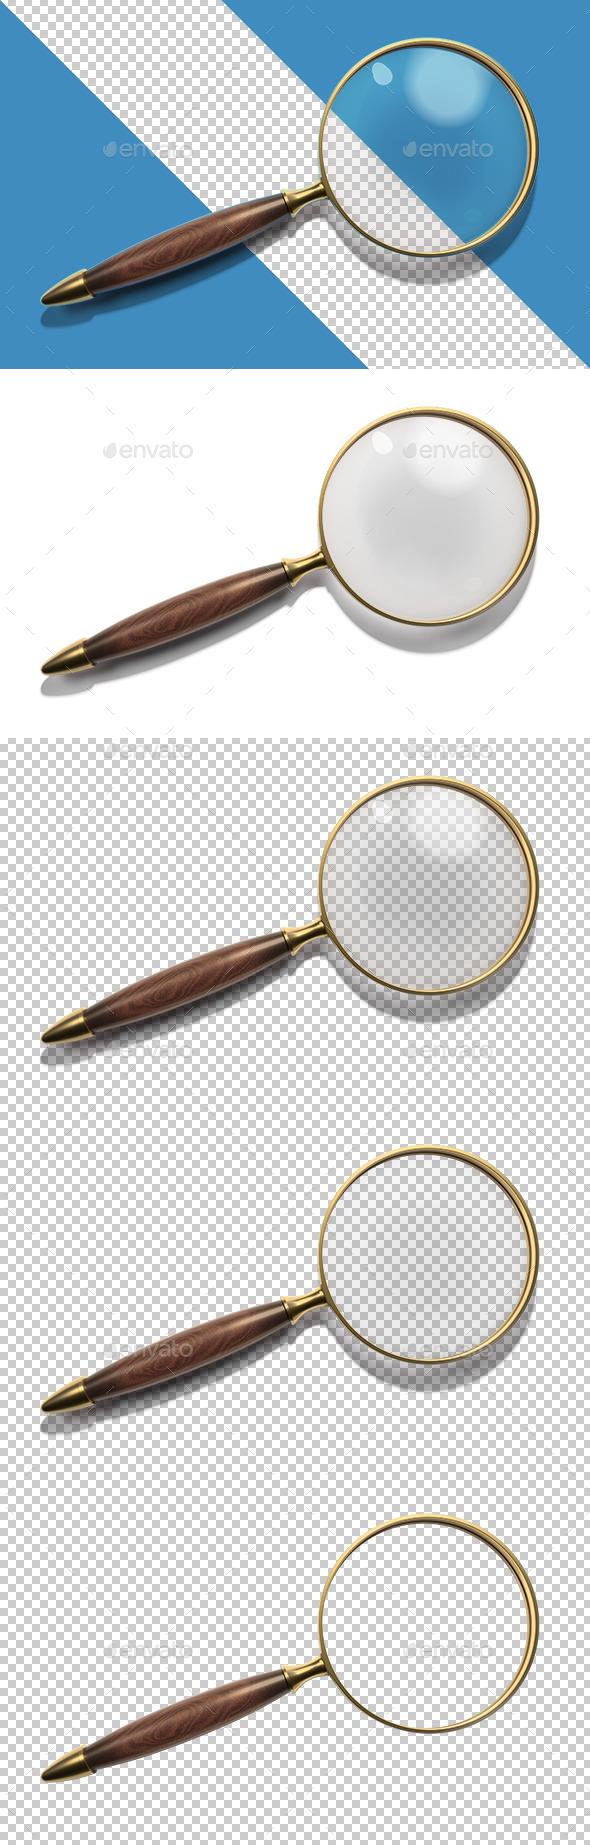 GraphicRiver Vintage Magnifier 11302851